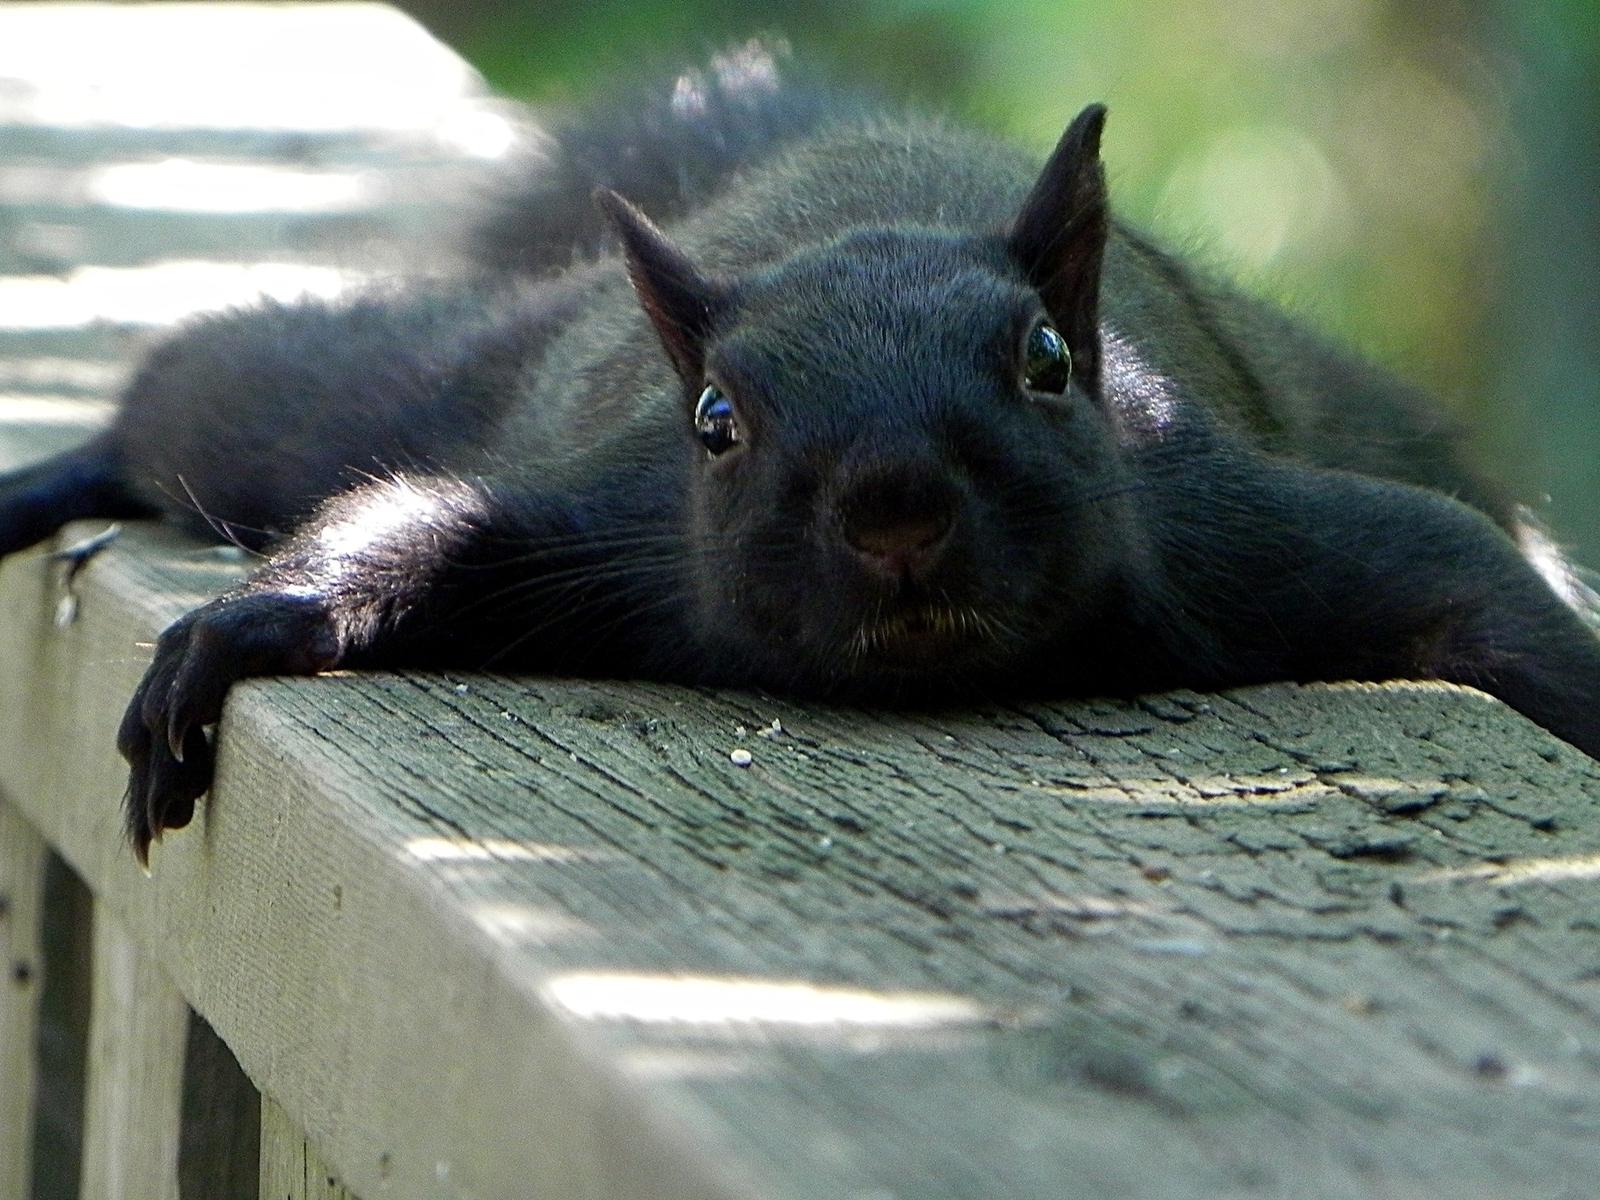 Animals funny squirrels (1600x1200)